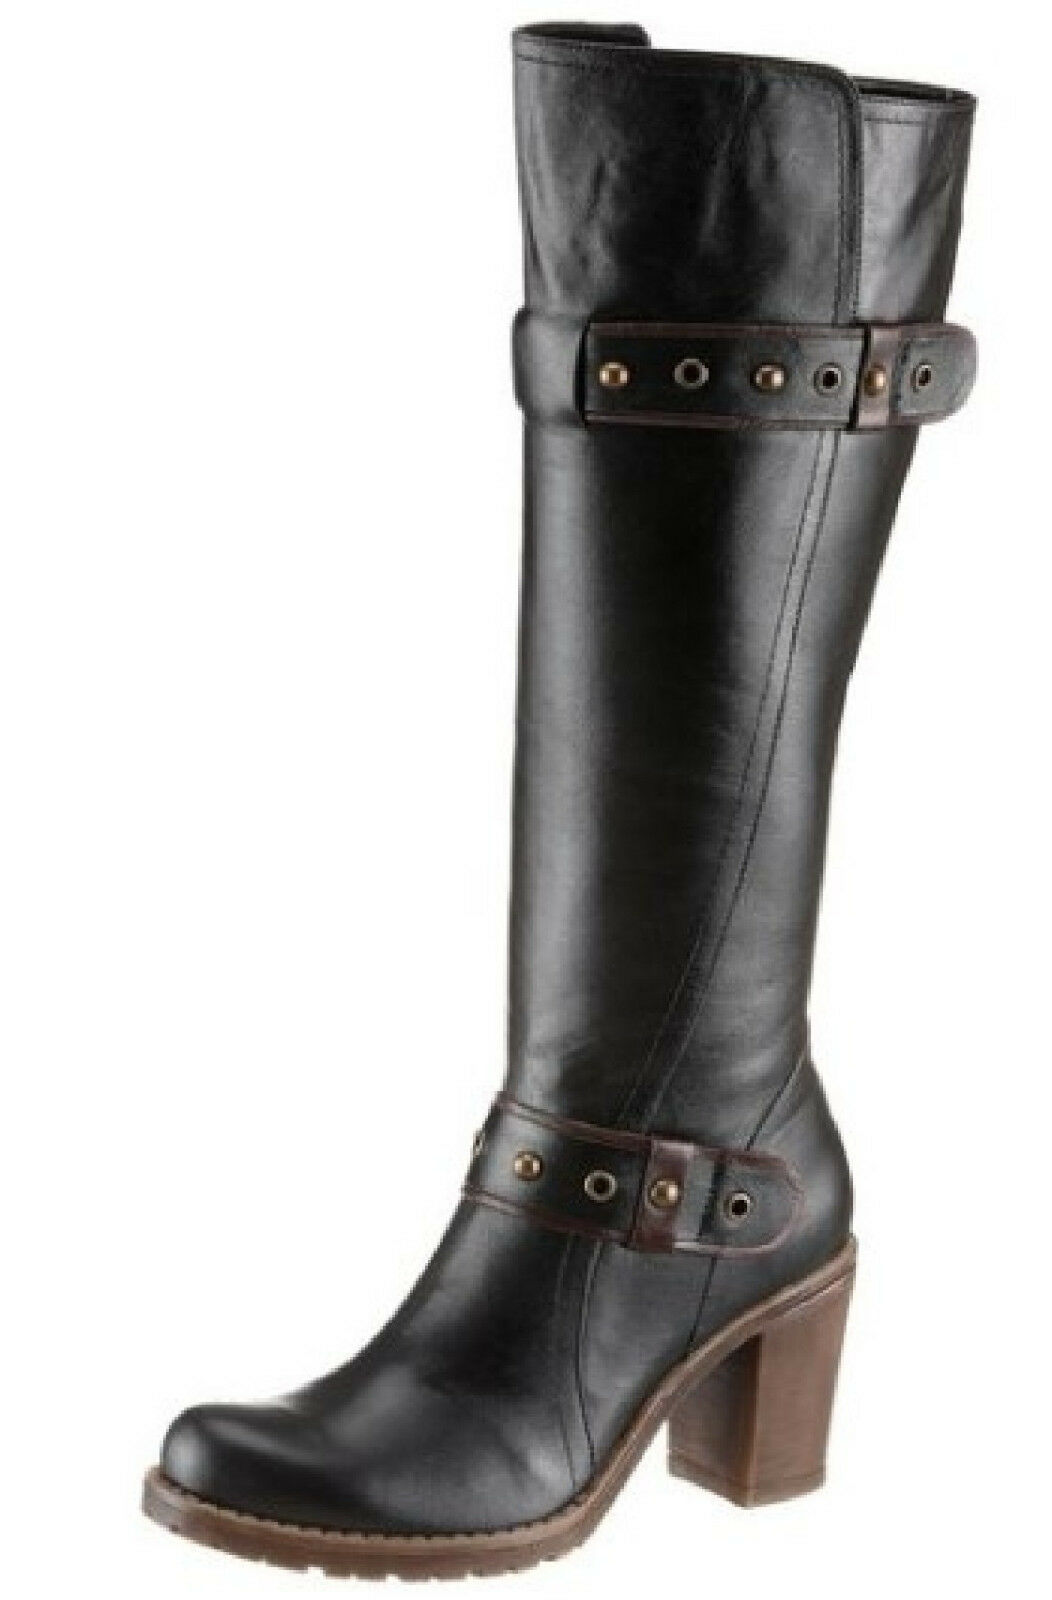 Hush Puppies botas 40 Echt Leder negro señora botas botas botas zapato párrafo moderno nueva  n ° 1 en línea